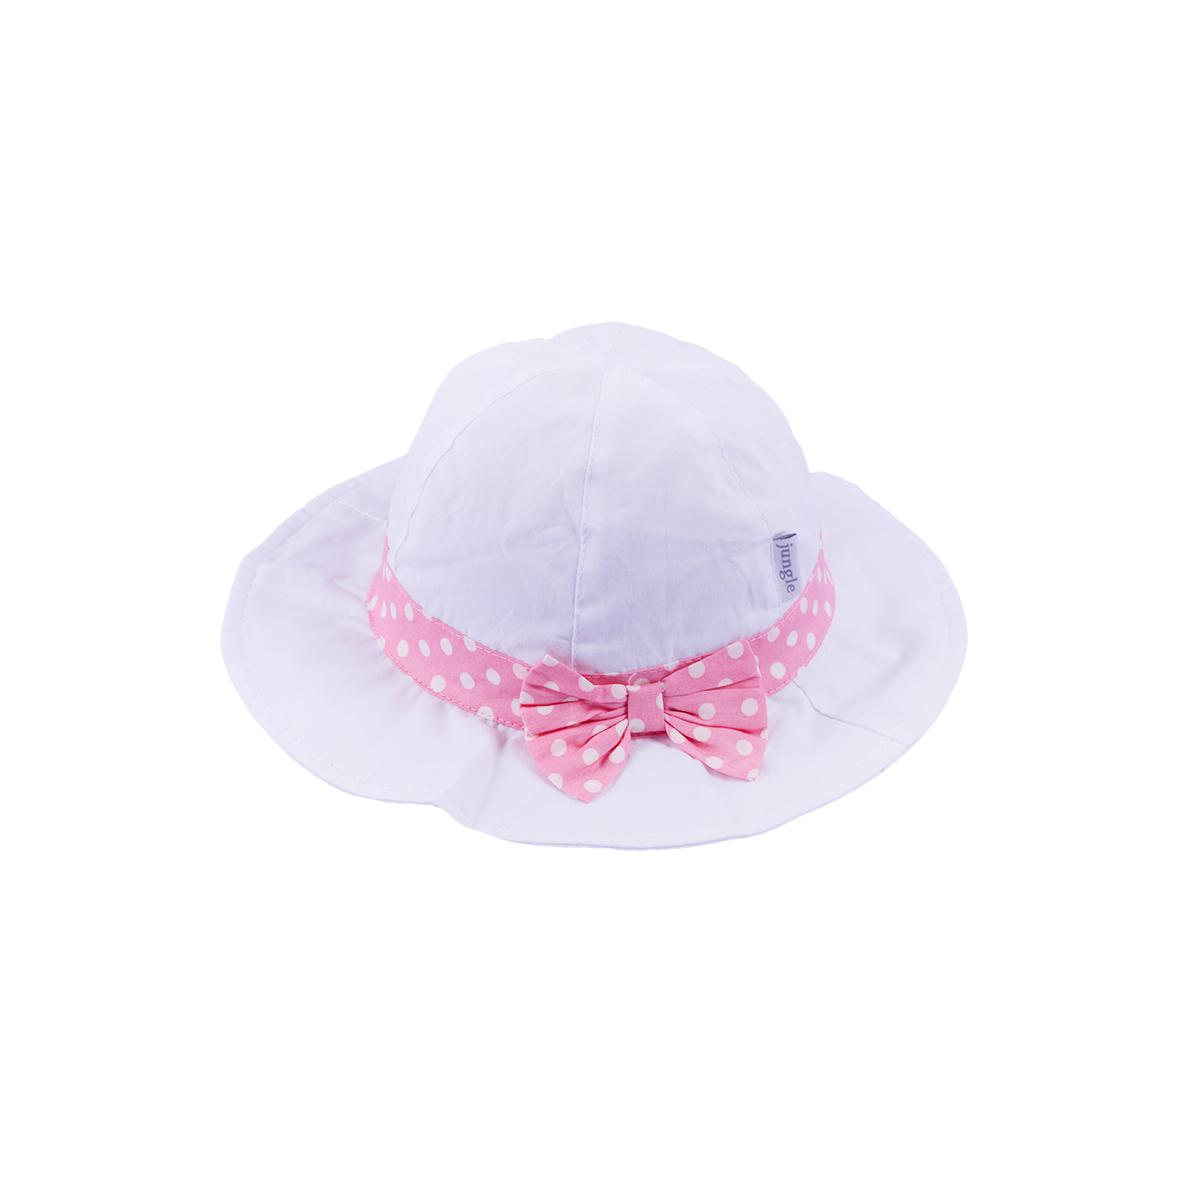 Jungle šešir S19-10, 50-56